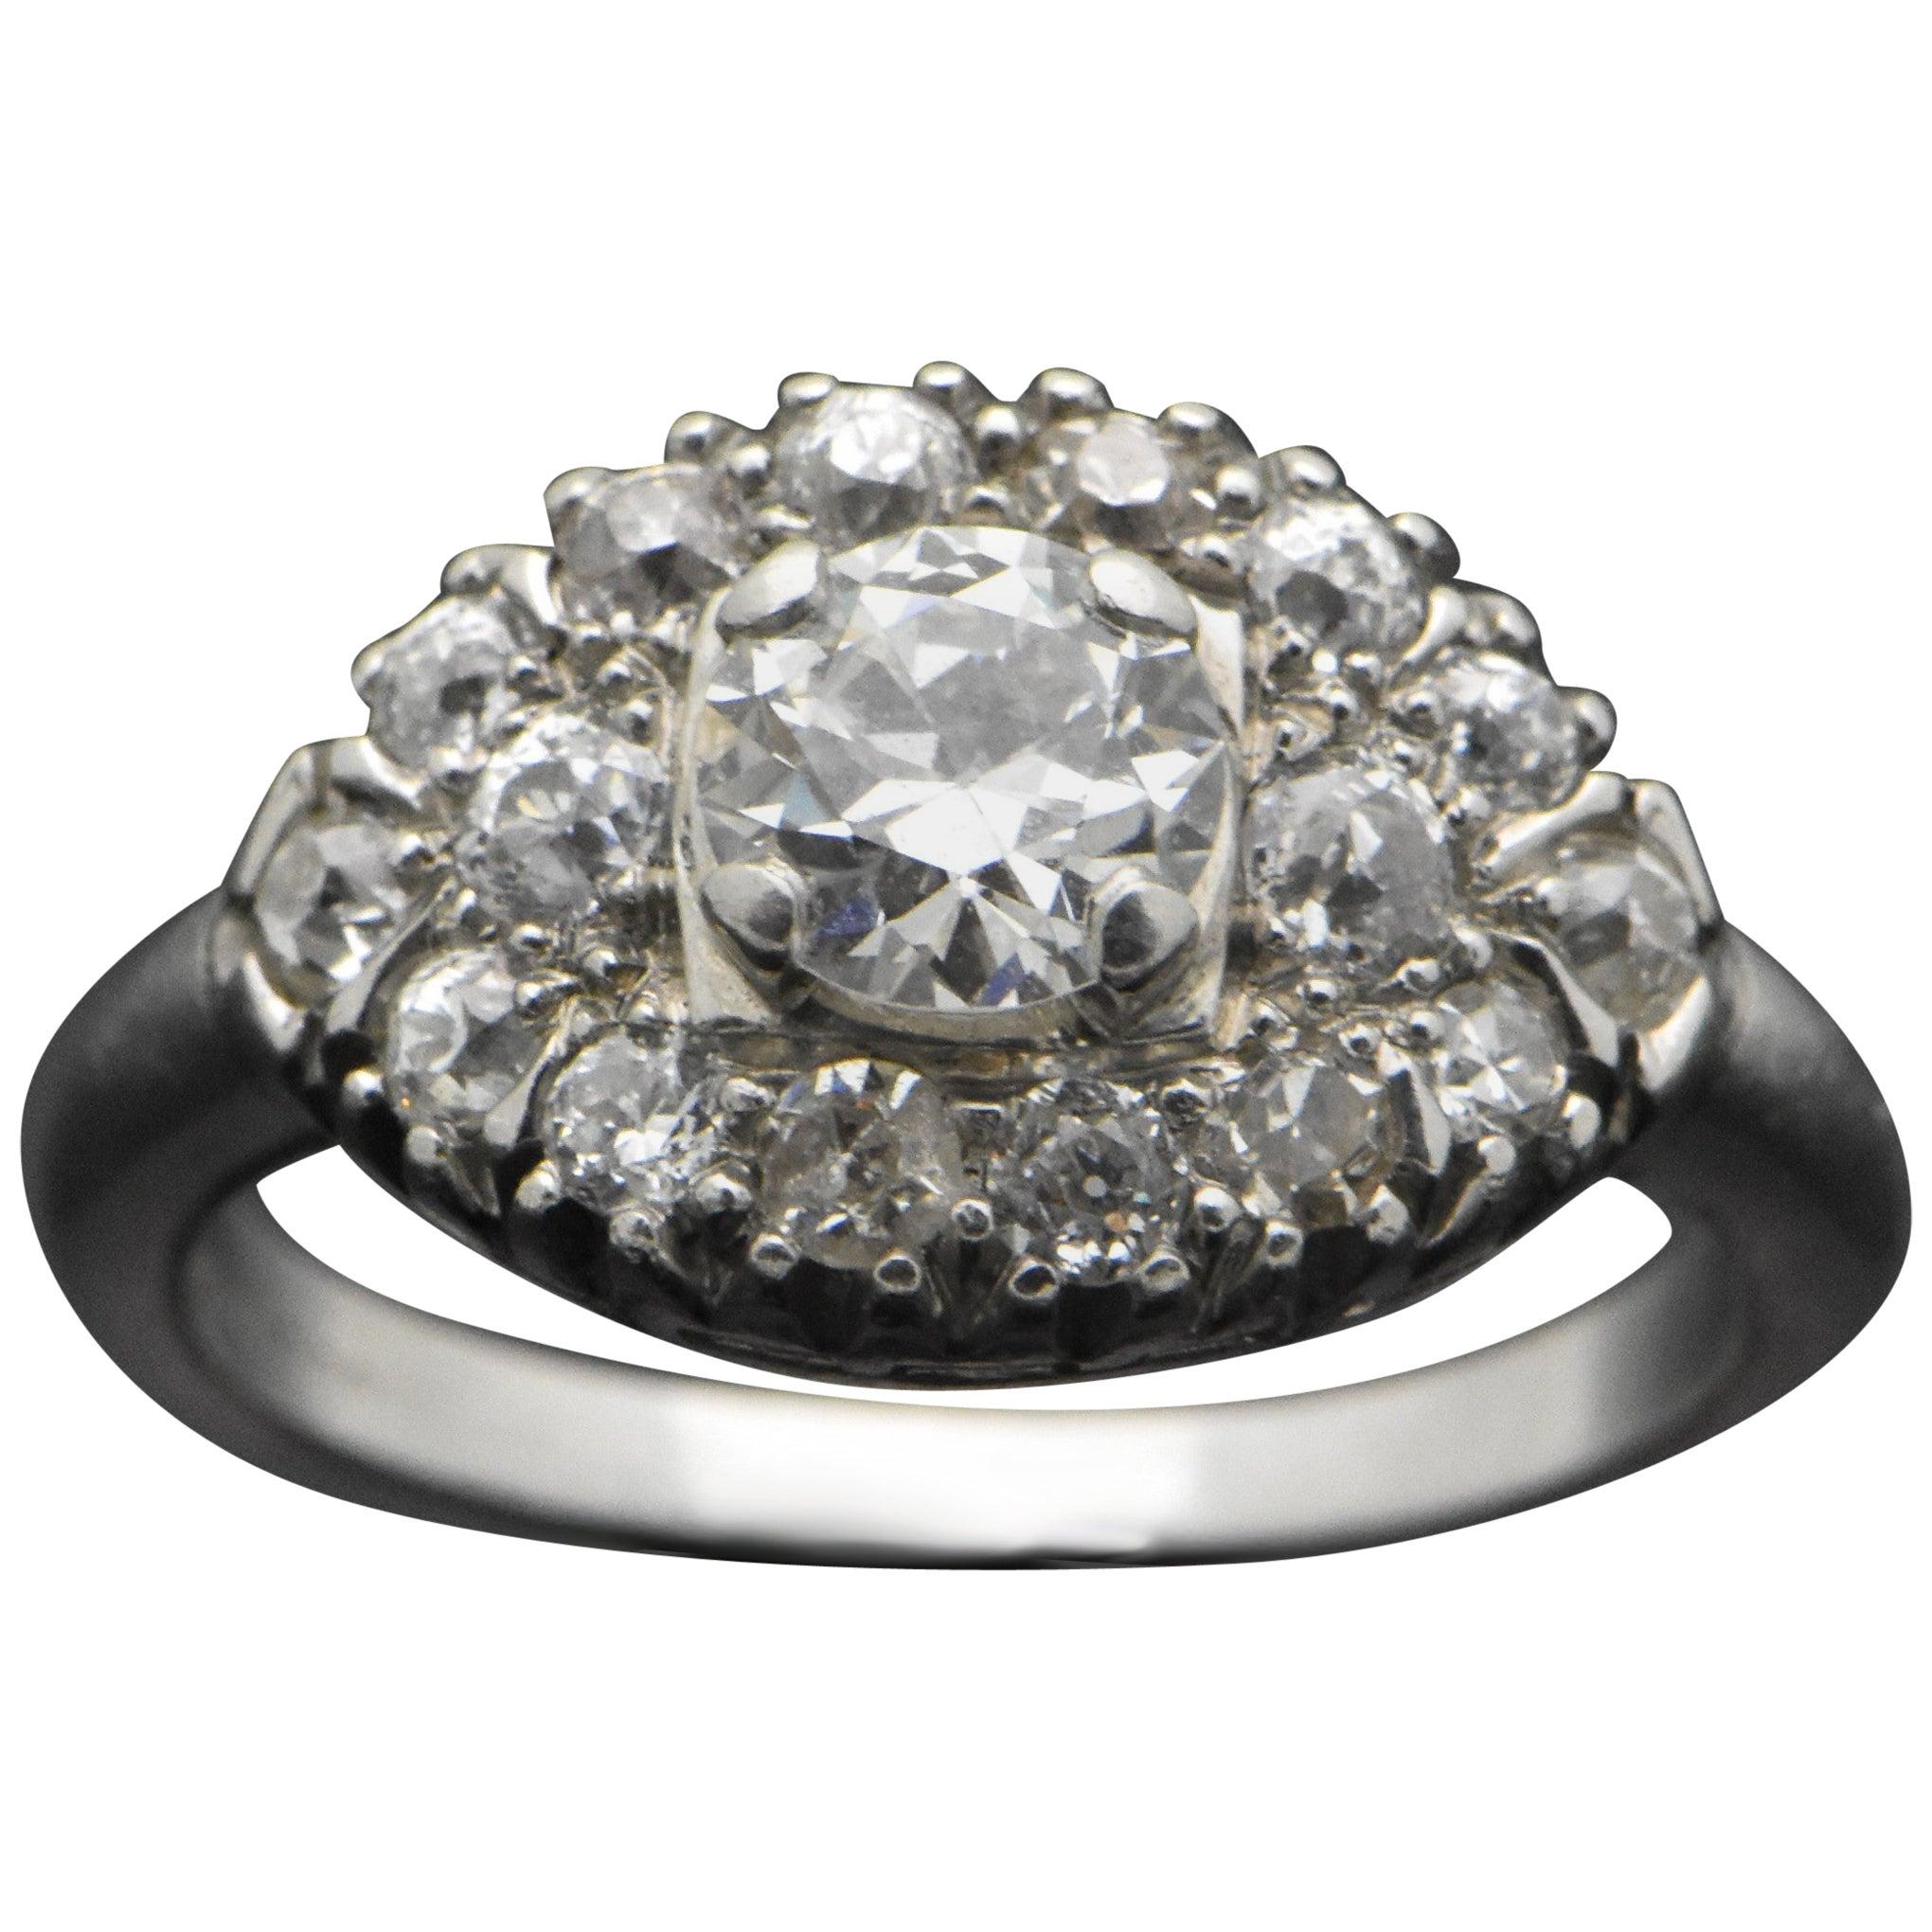 Vintage Platinum Ring with Diamonds